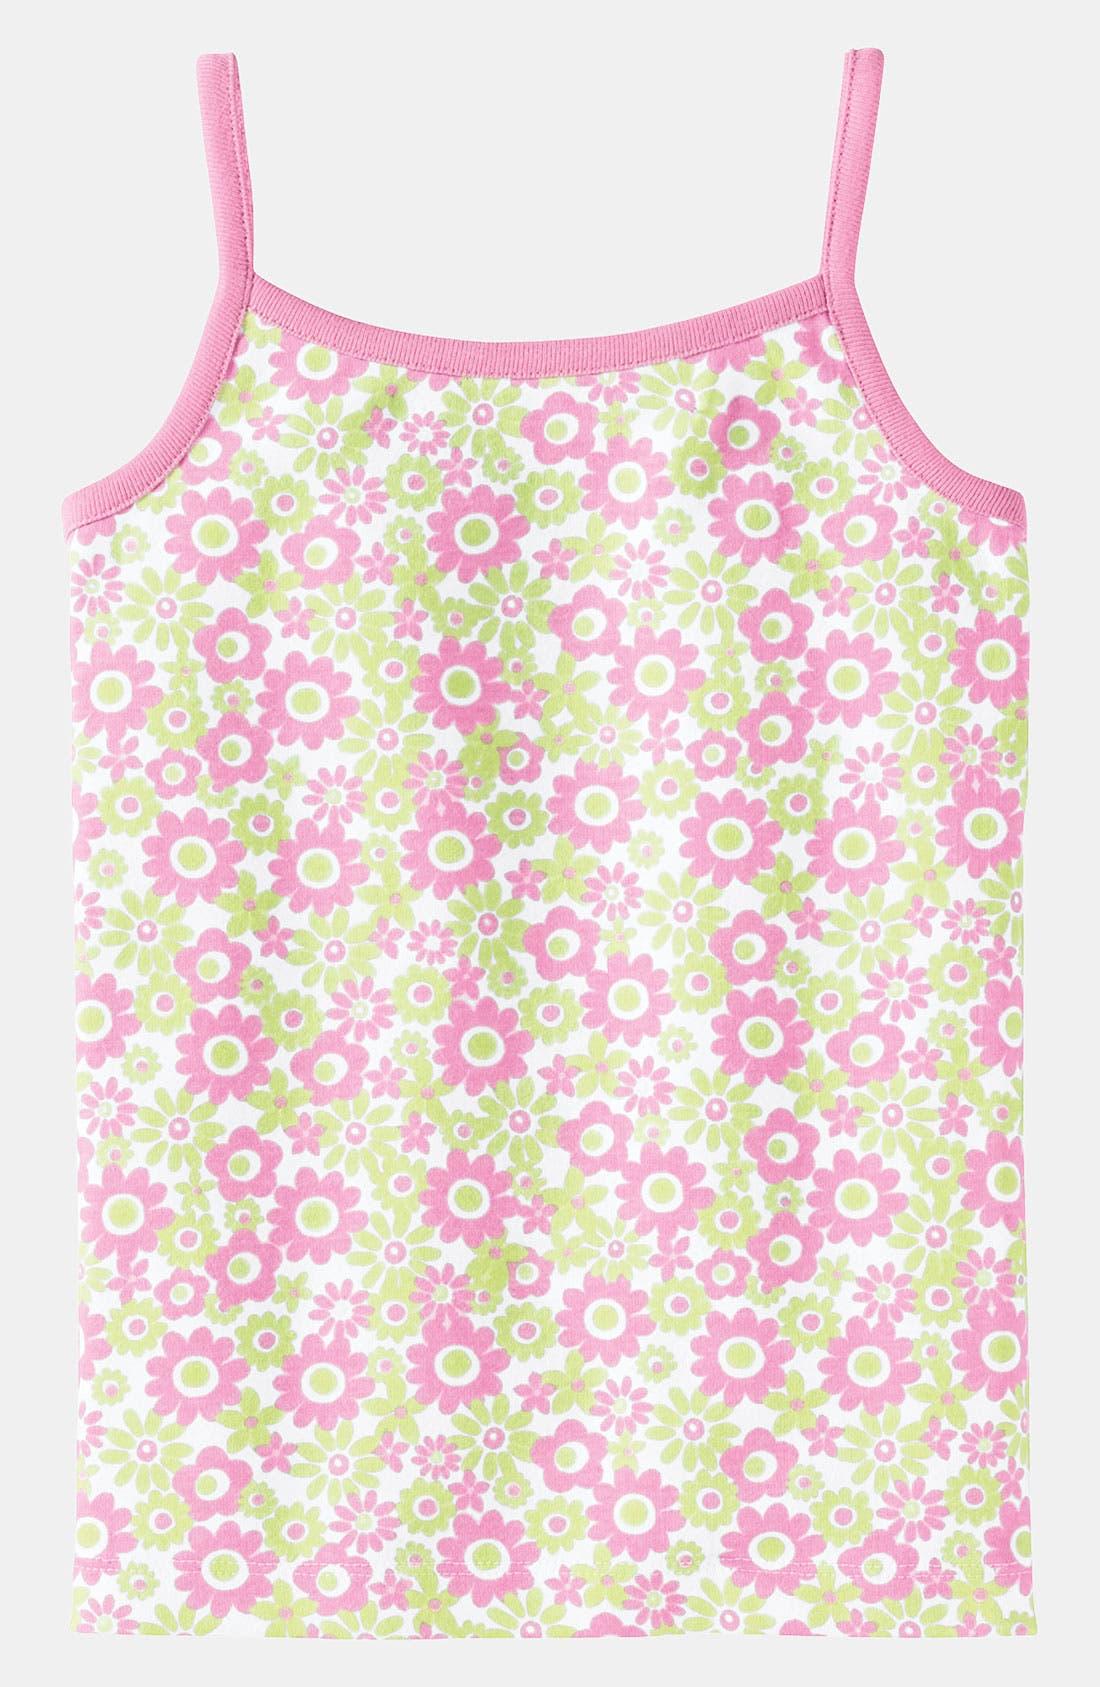 Main Image - Hanna Andersson Organic Cotton Camisole (Little Girls & Big Girls)